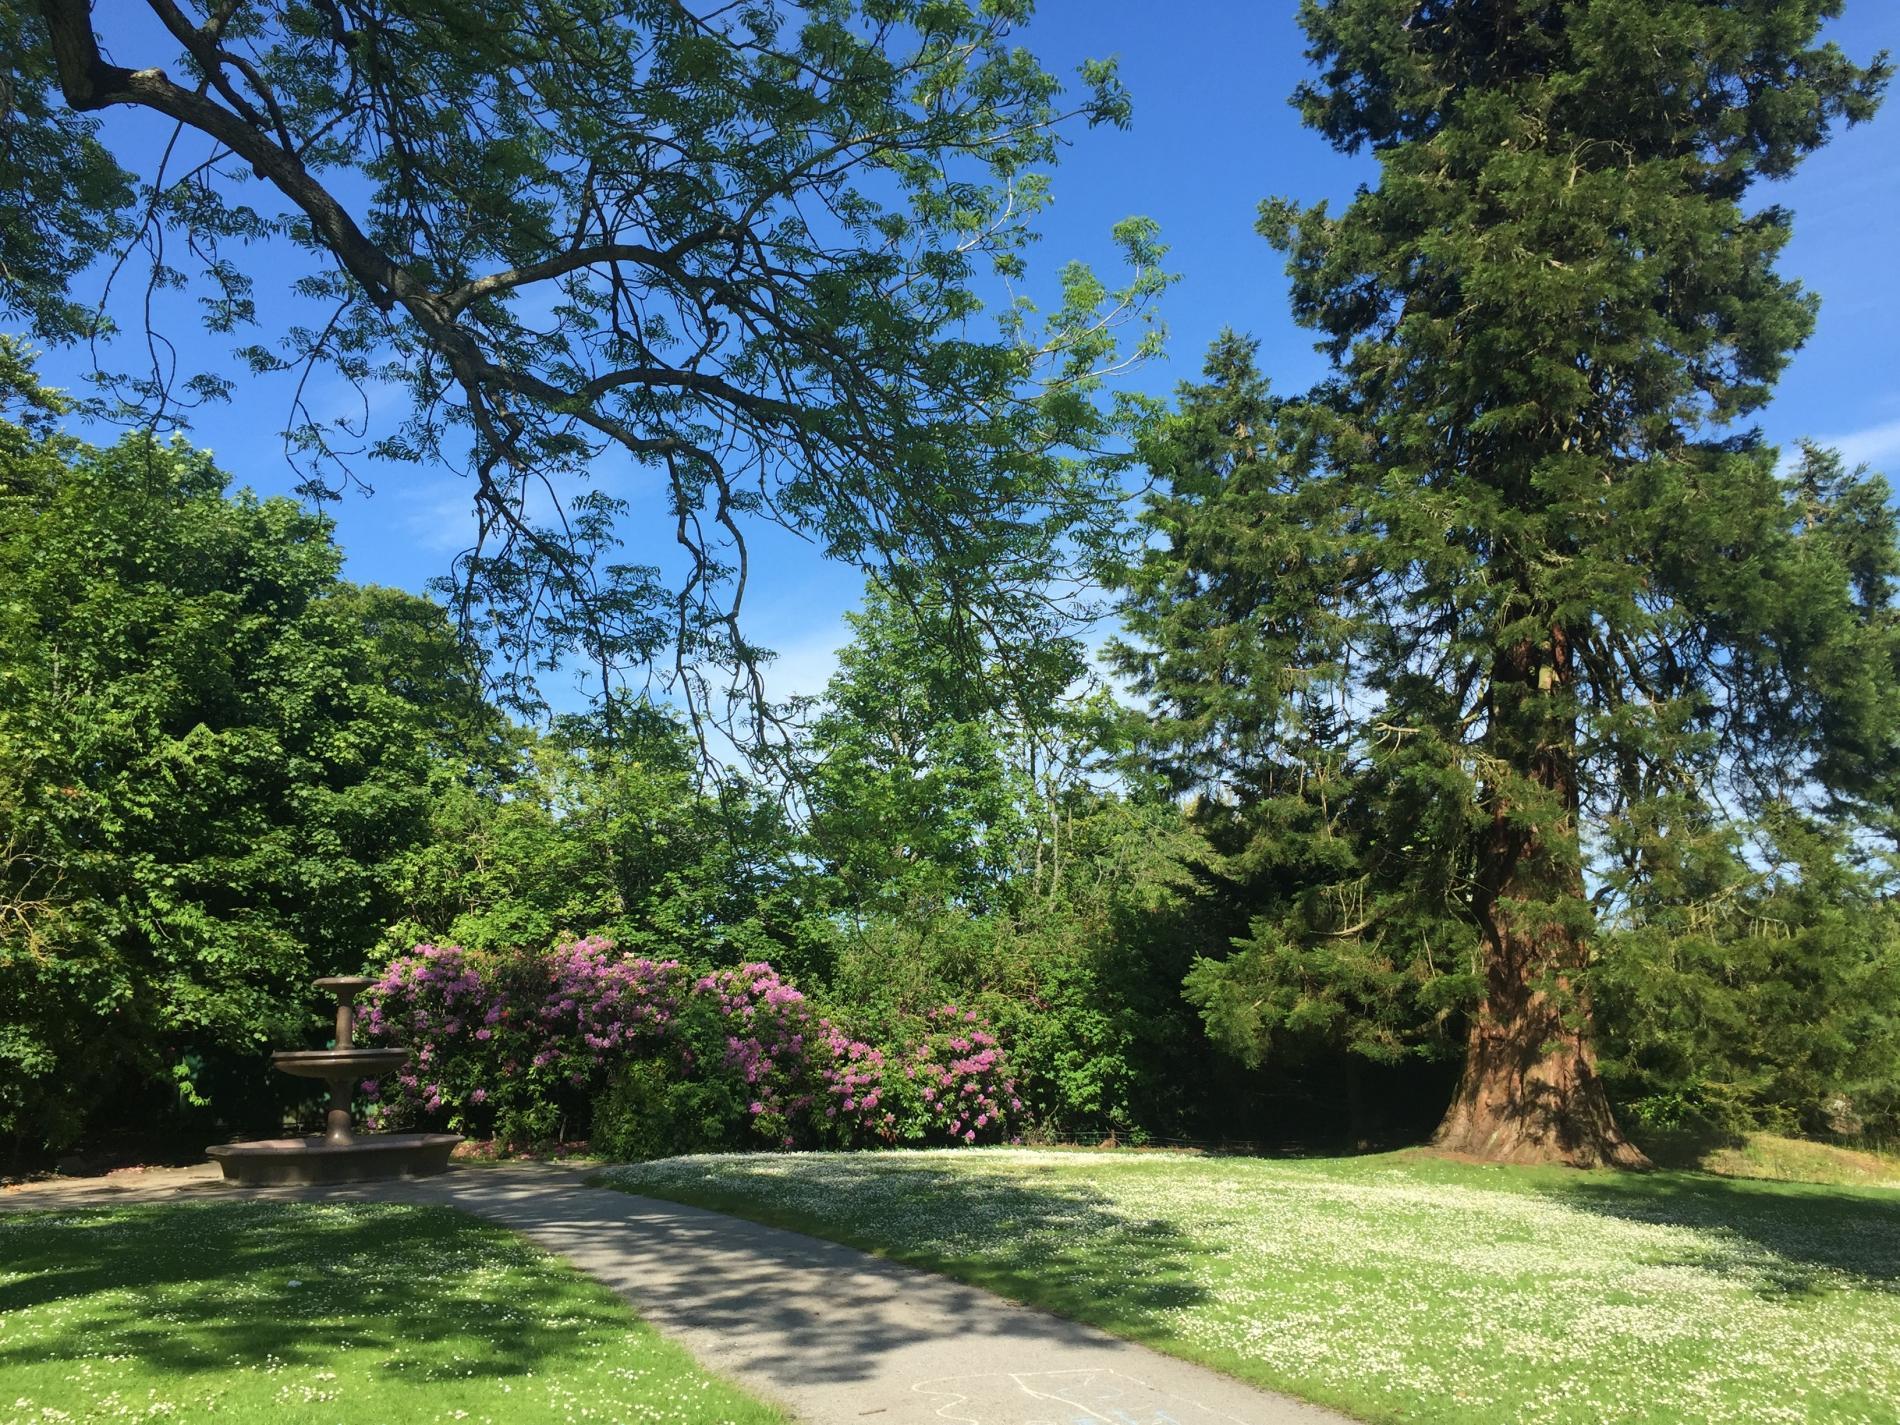 hazlehead park visitaberdeenshire